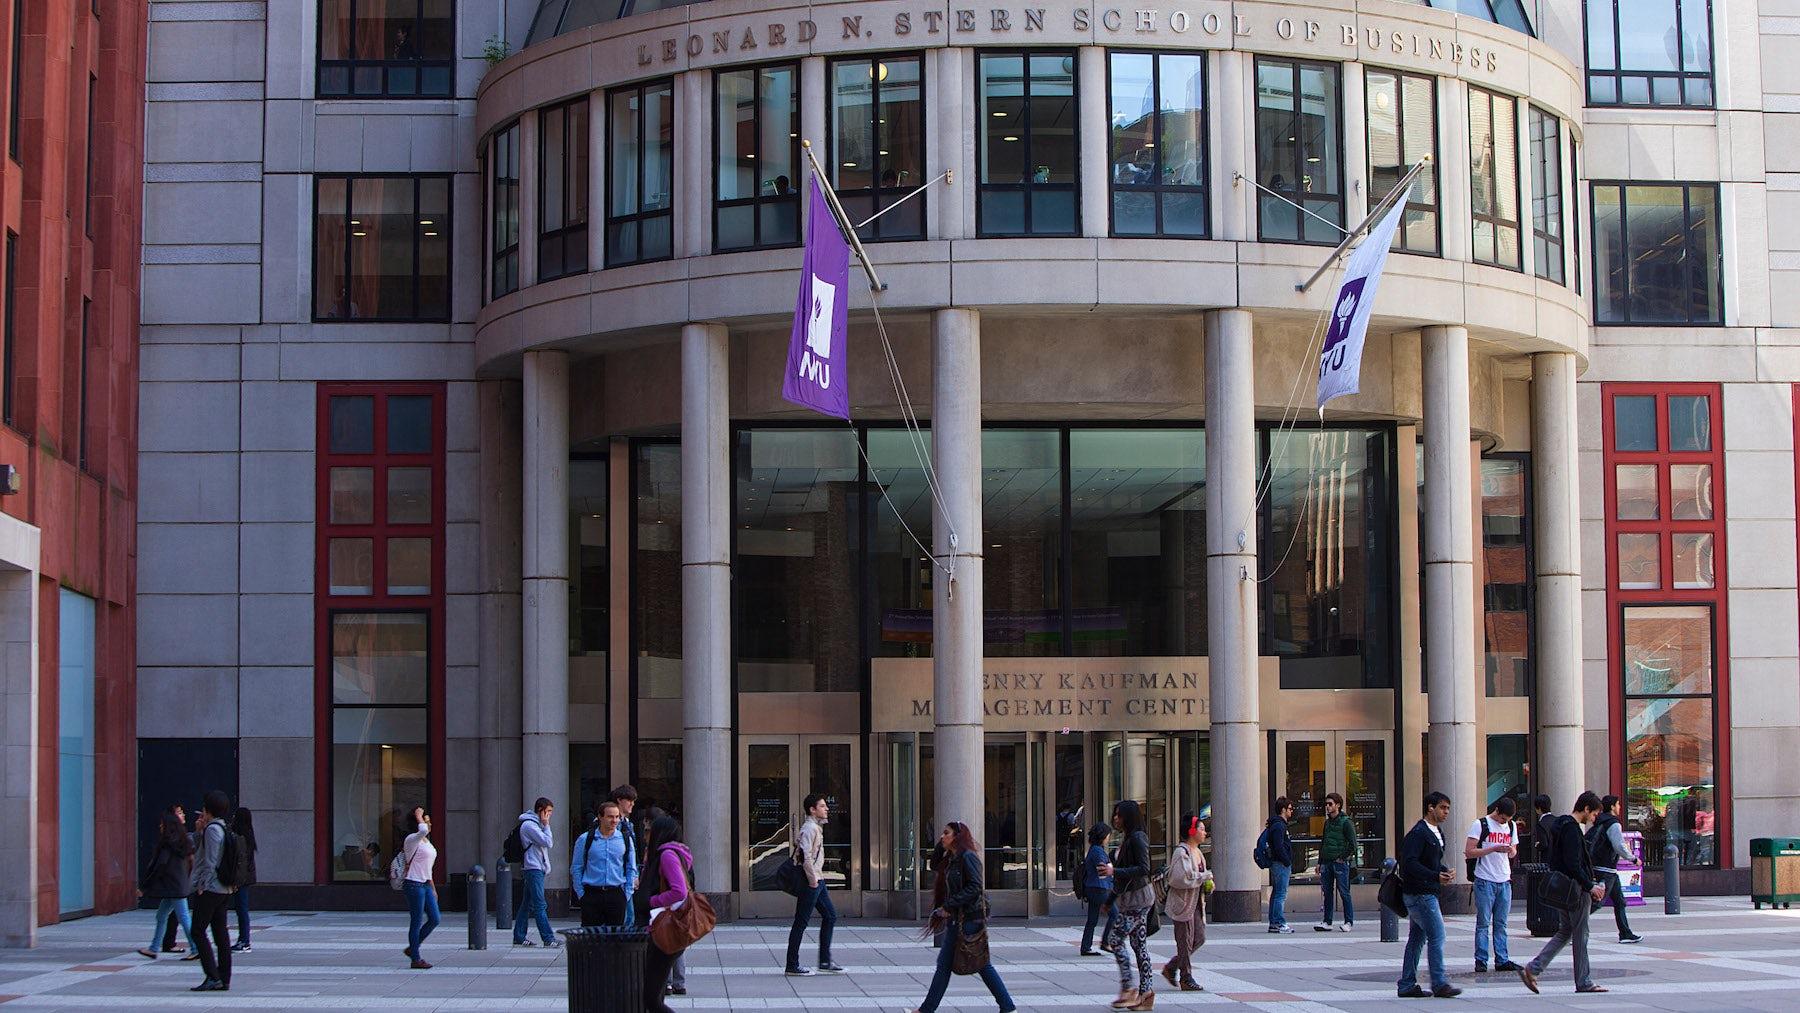 NYU Stern Campus in Greenwich, NYC | Source: Shutterstock